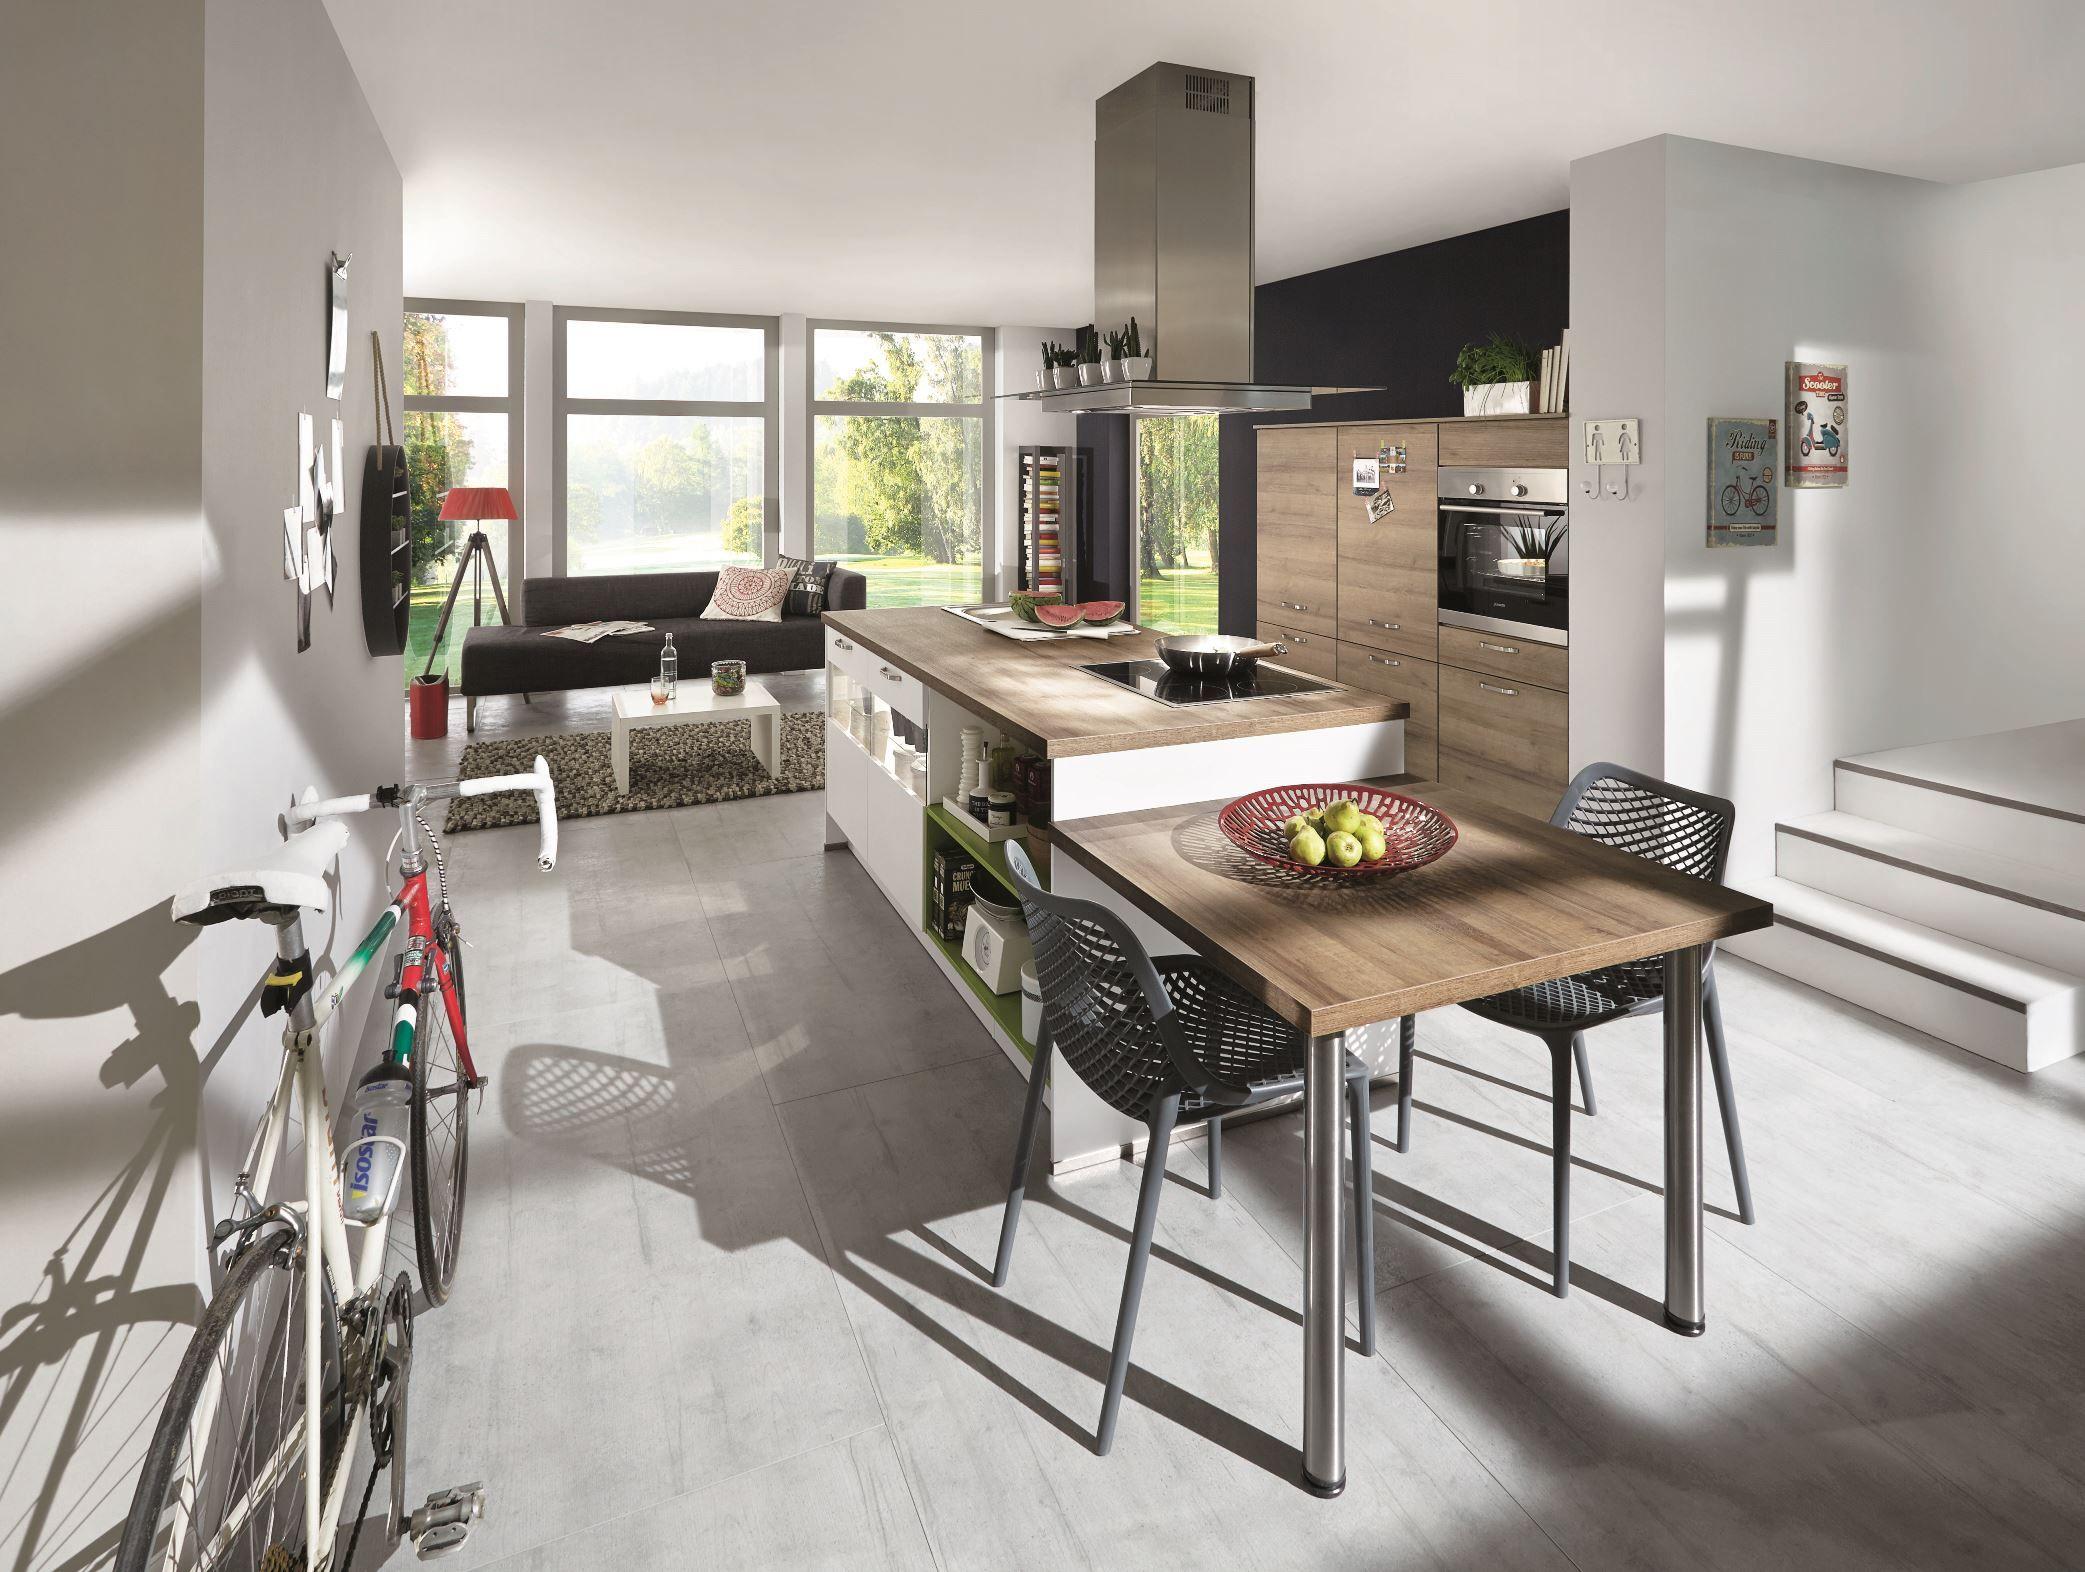 catalogo de cocinas cocinas kuchenhouse. Black Bedroom Furniture Sets. Home Design Ideas